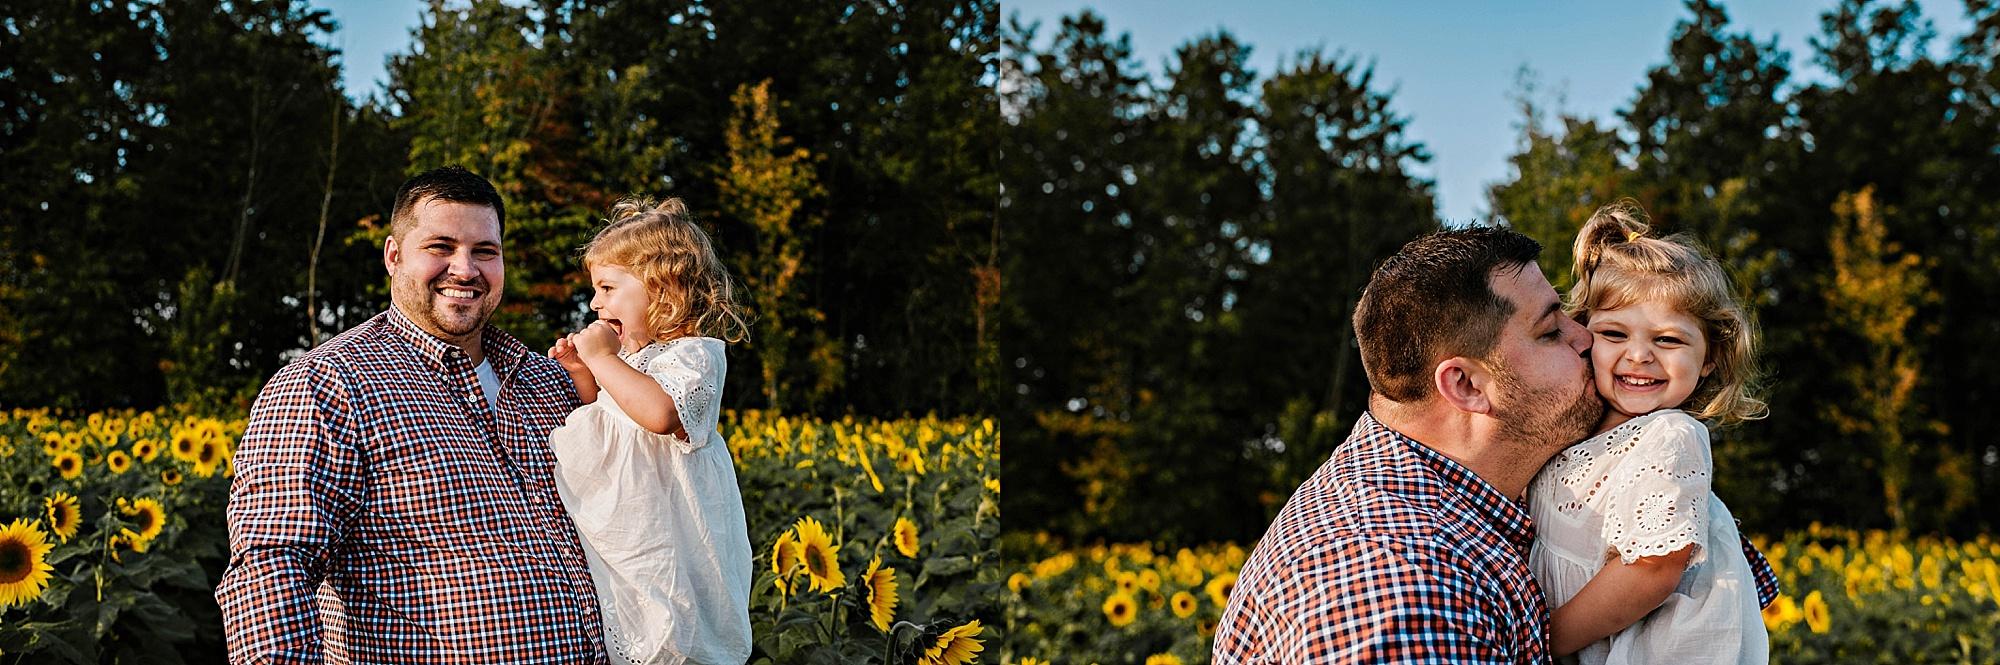 Rutherford-family-cleveland-photographer-lauren-grayson-sunflower-field-session_0030.jpg